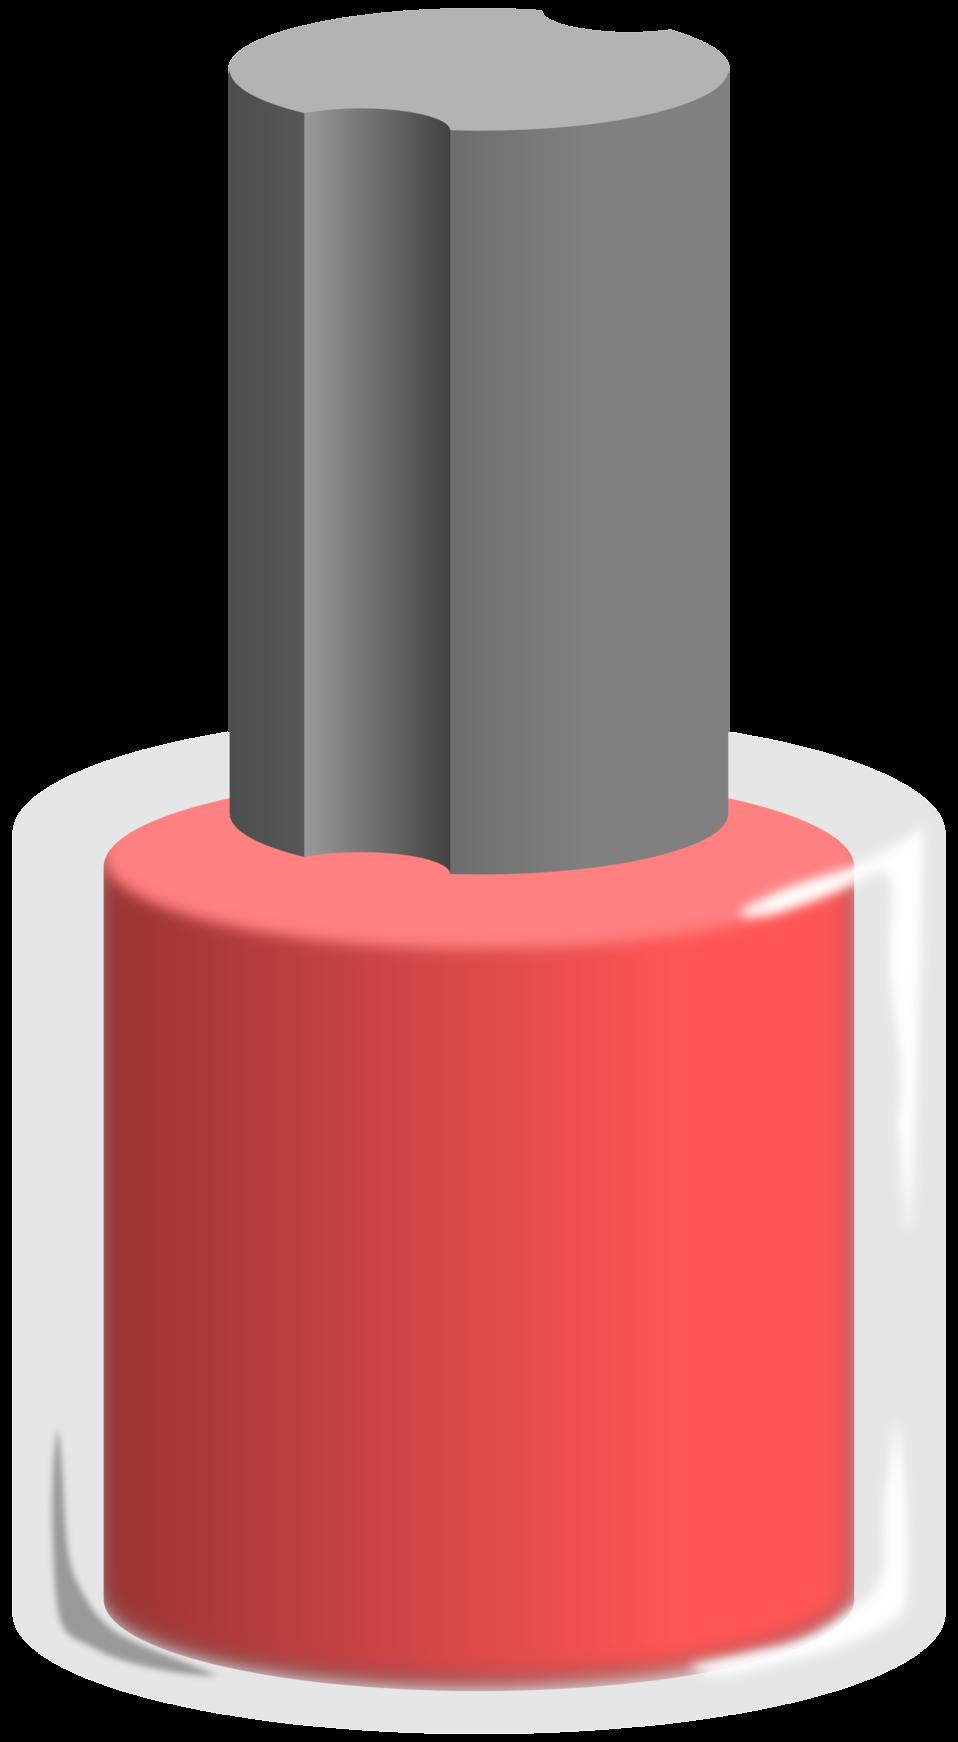 Public domain clip art. Nail clipart nail polish bottle